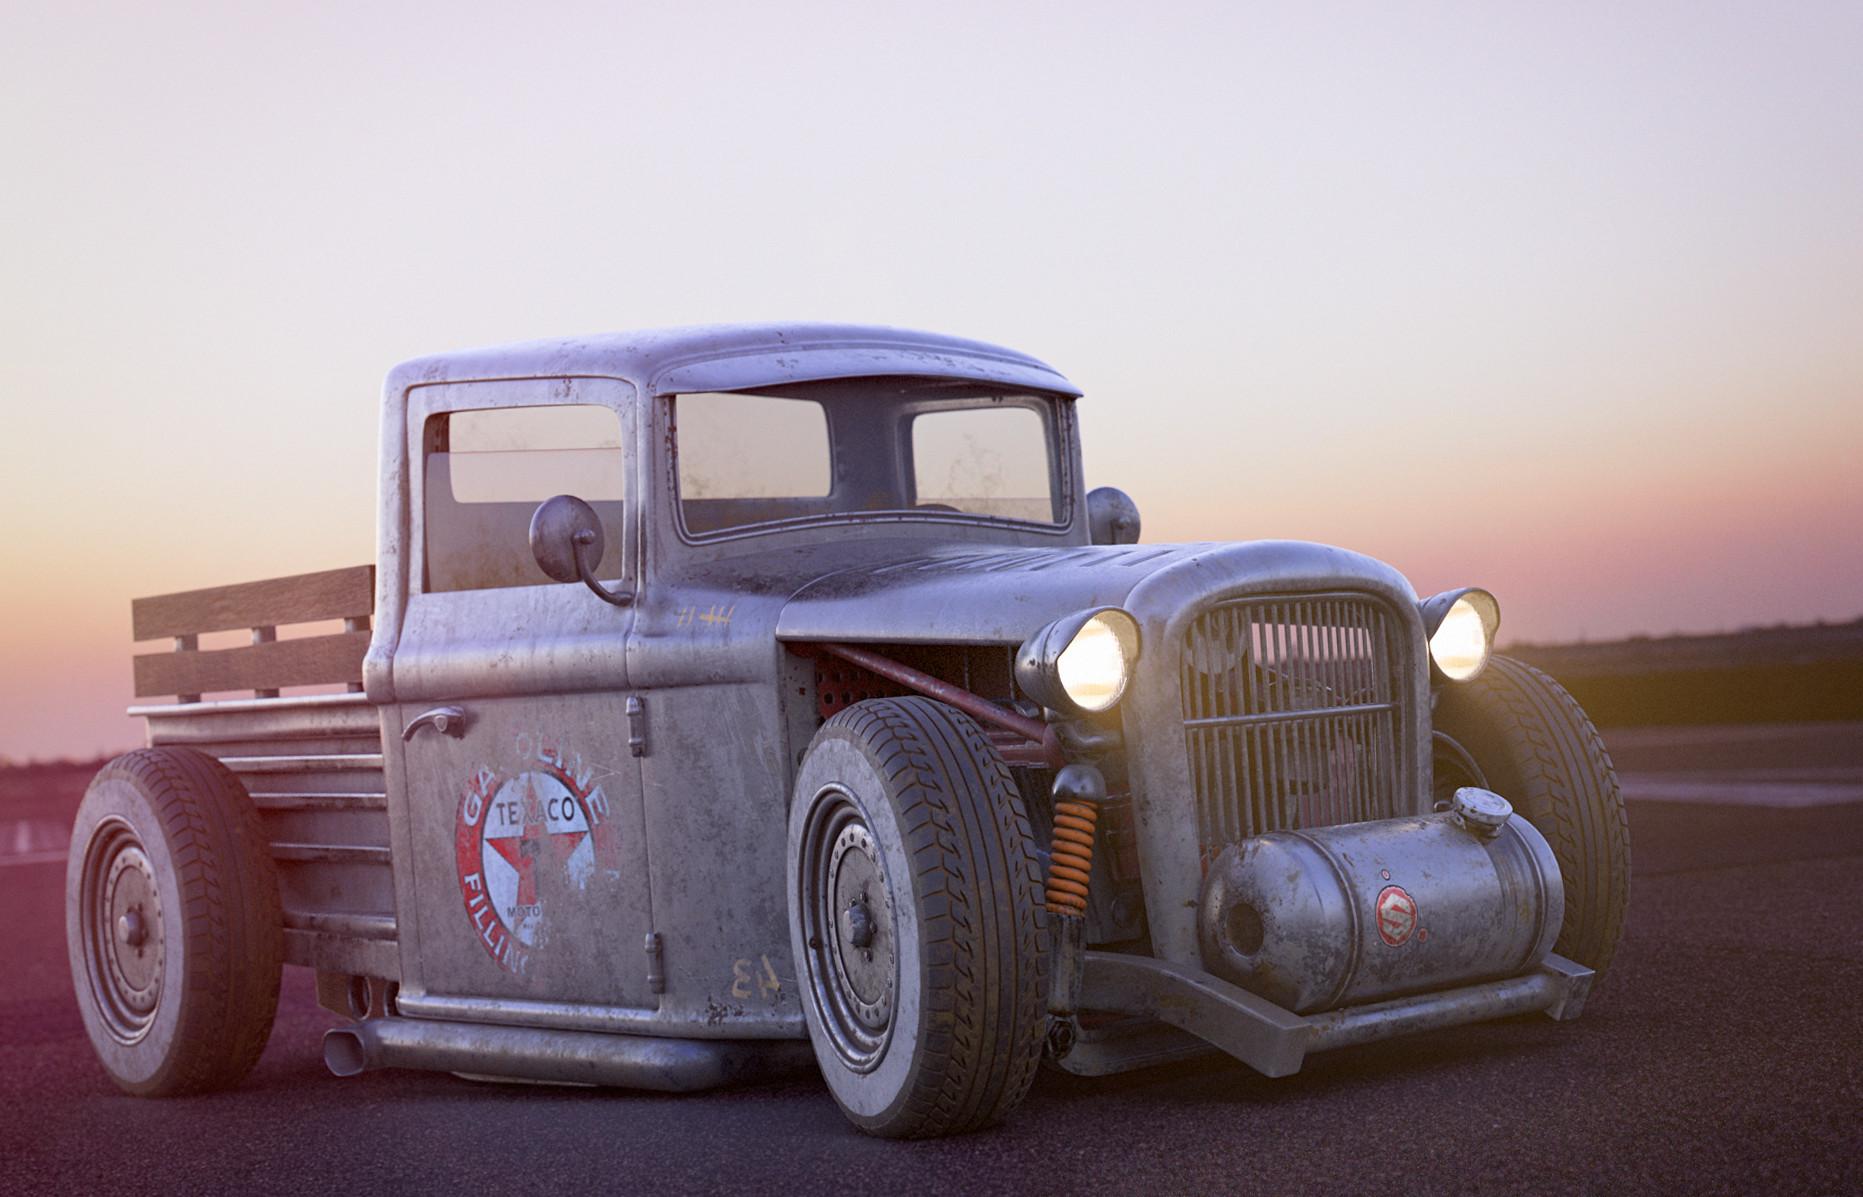 christophe desse - ford 28 truck hot rod for a live presentation ...